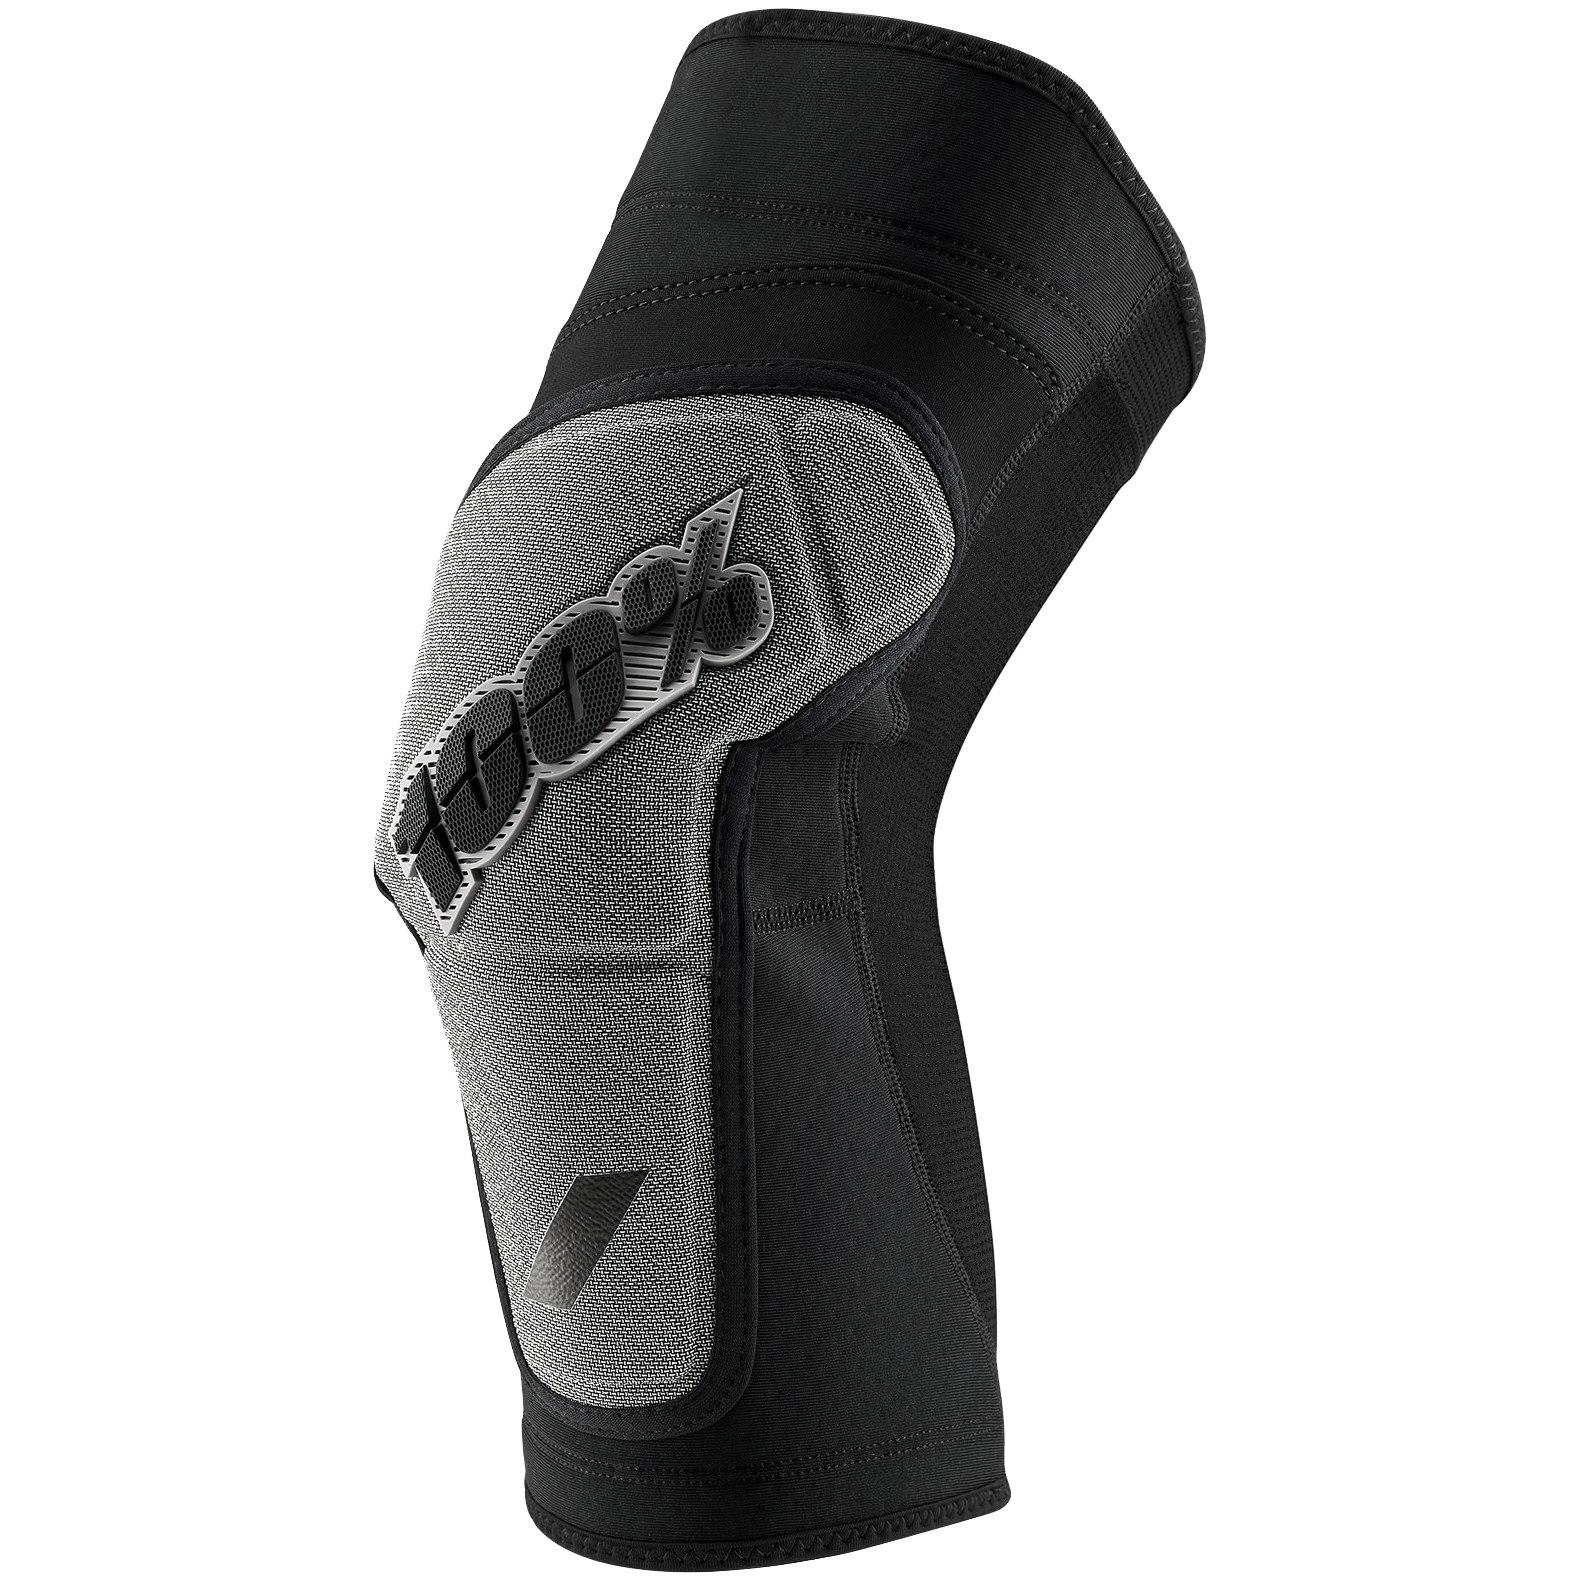 Imagen de 100% Ridecamp Knee Guard - Black/Grey